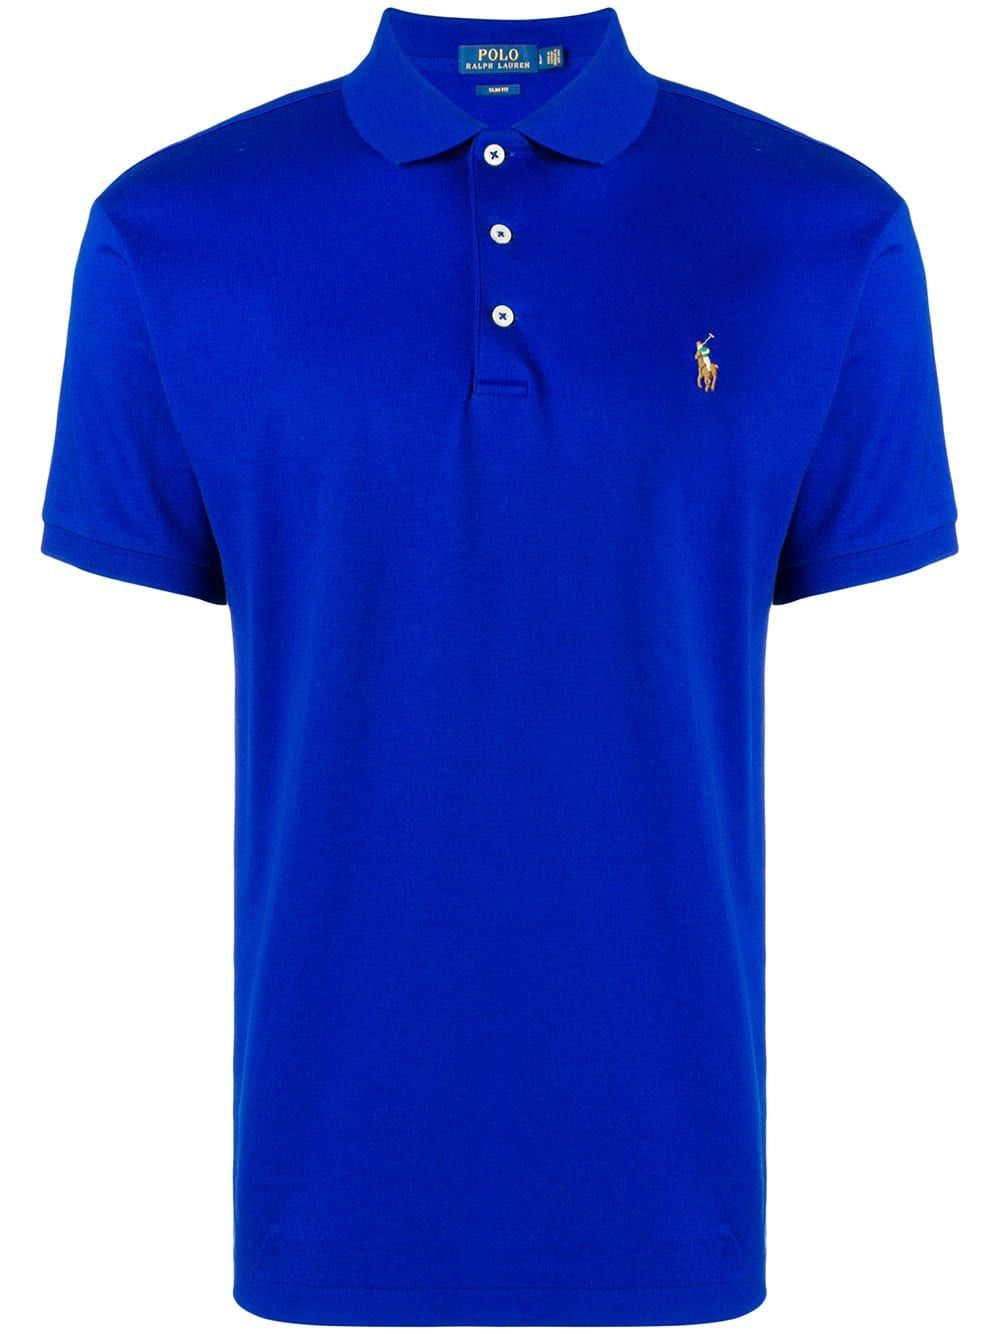 POLO RALPH LAUREN POLO RALPH LAUREN CLASSIC BRAND POLO SHIRT - BLUE.   poloralphlauren  cloth 57c6e9cac9